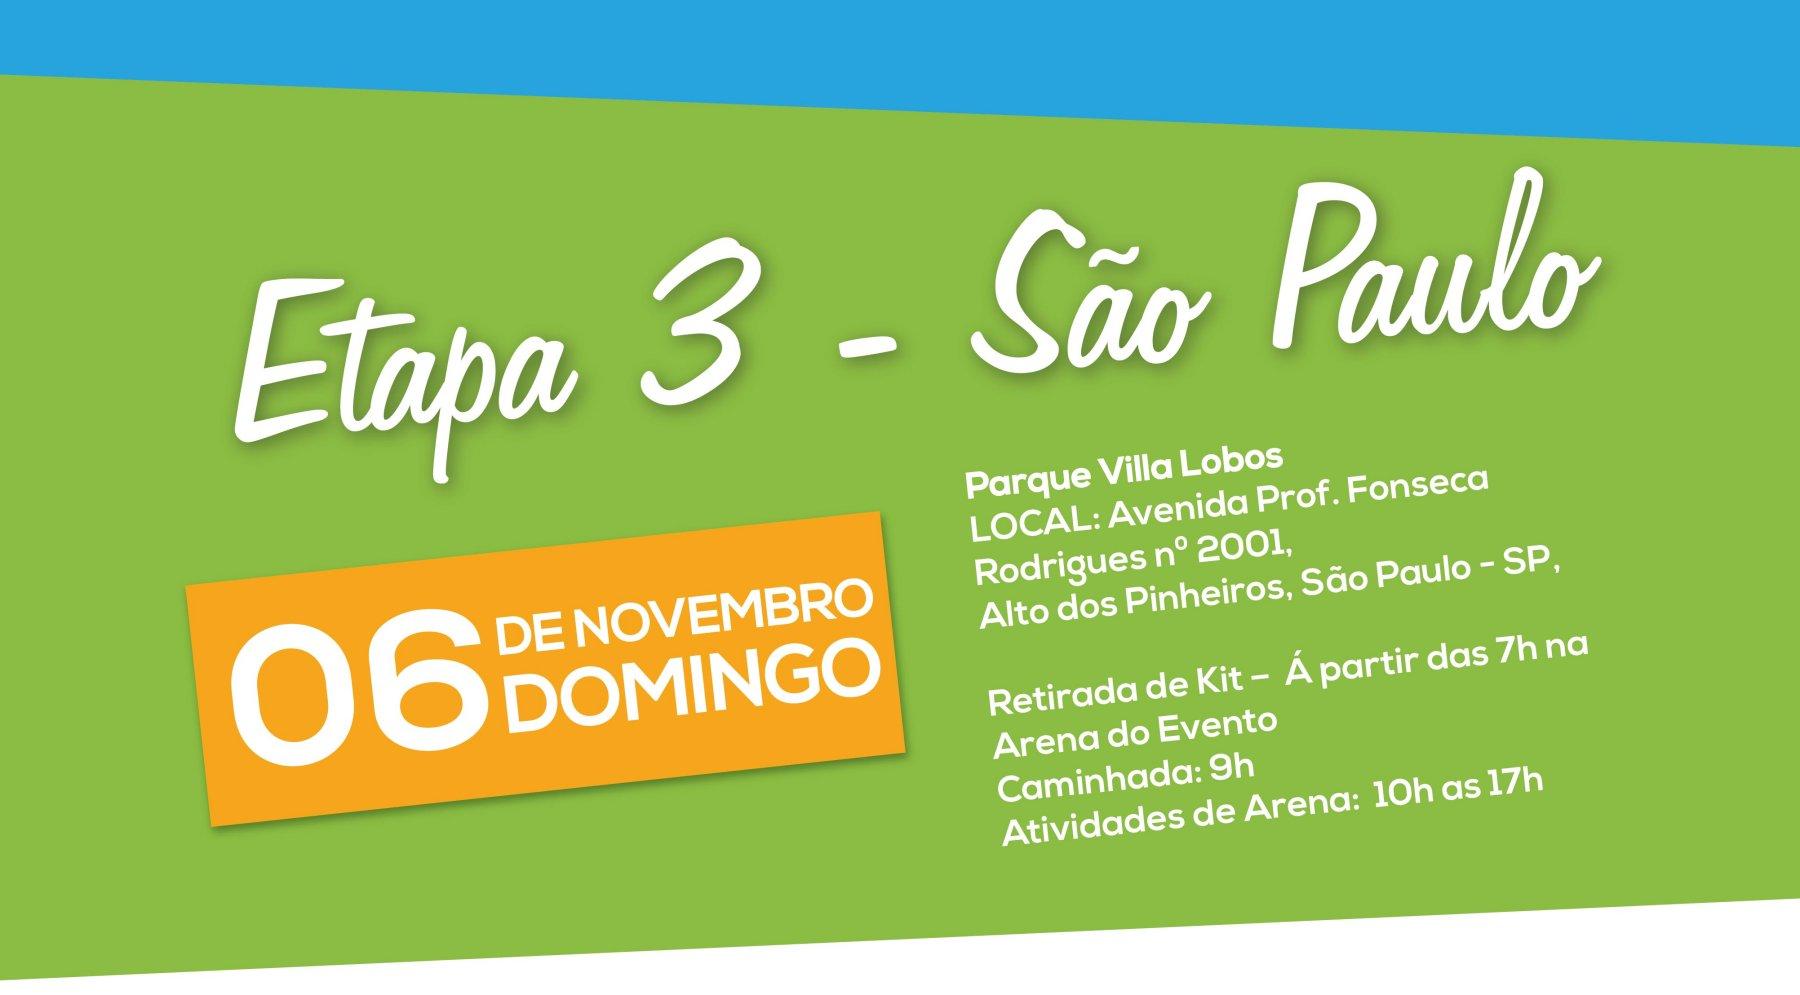 etapa-3-sao-paulo